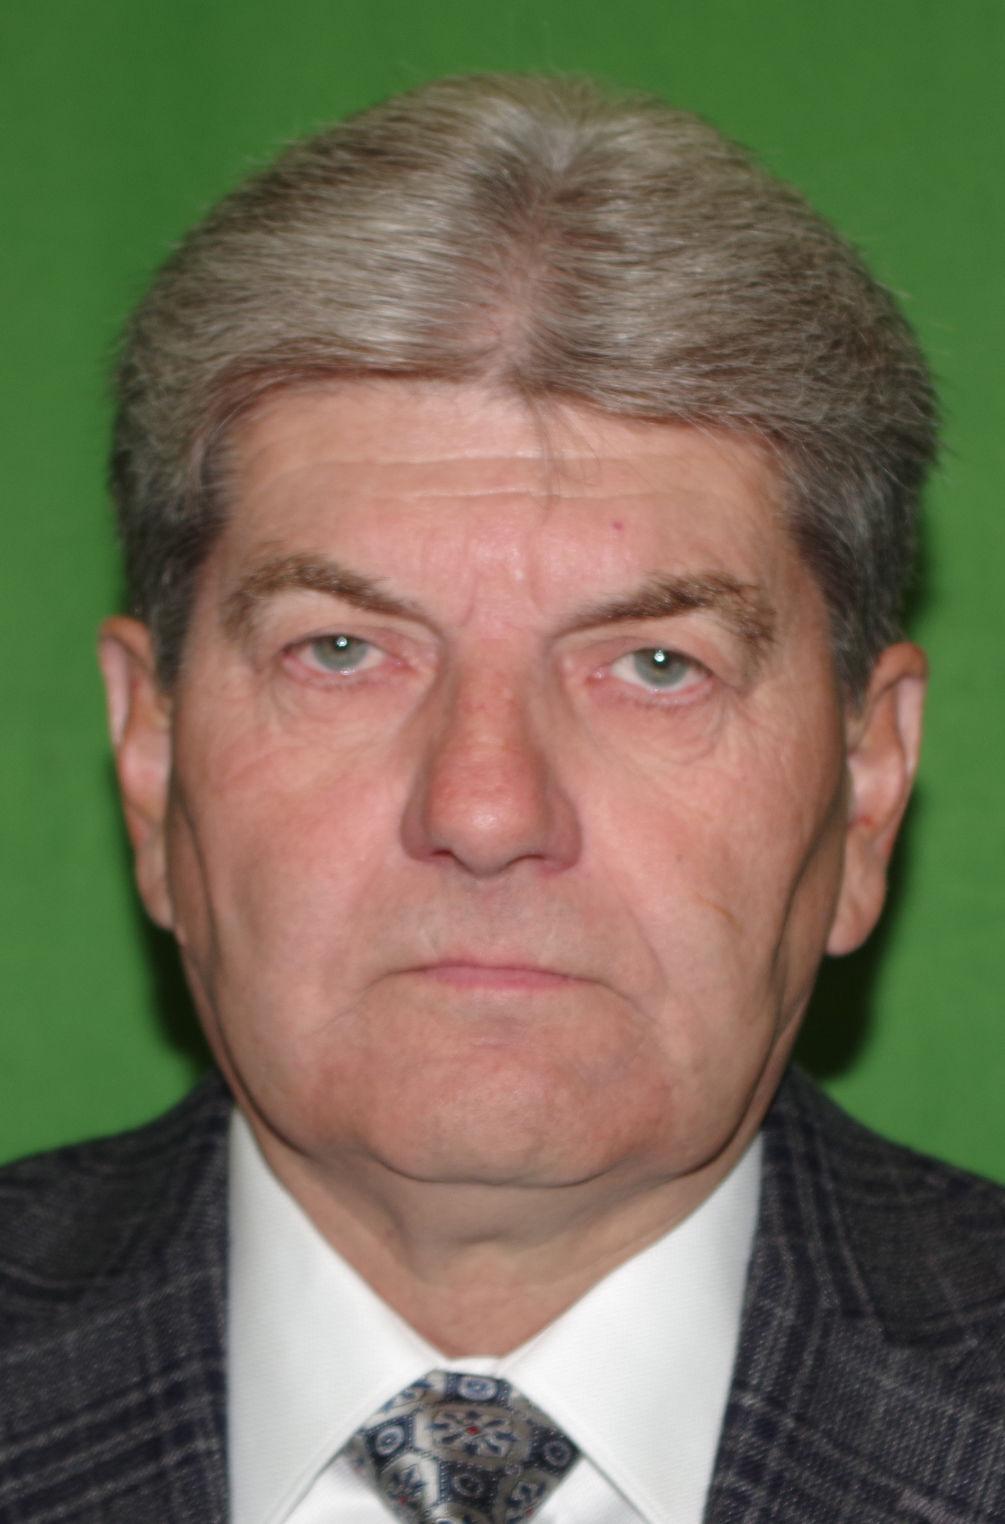 Jeff Raybould